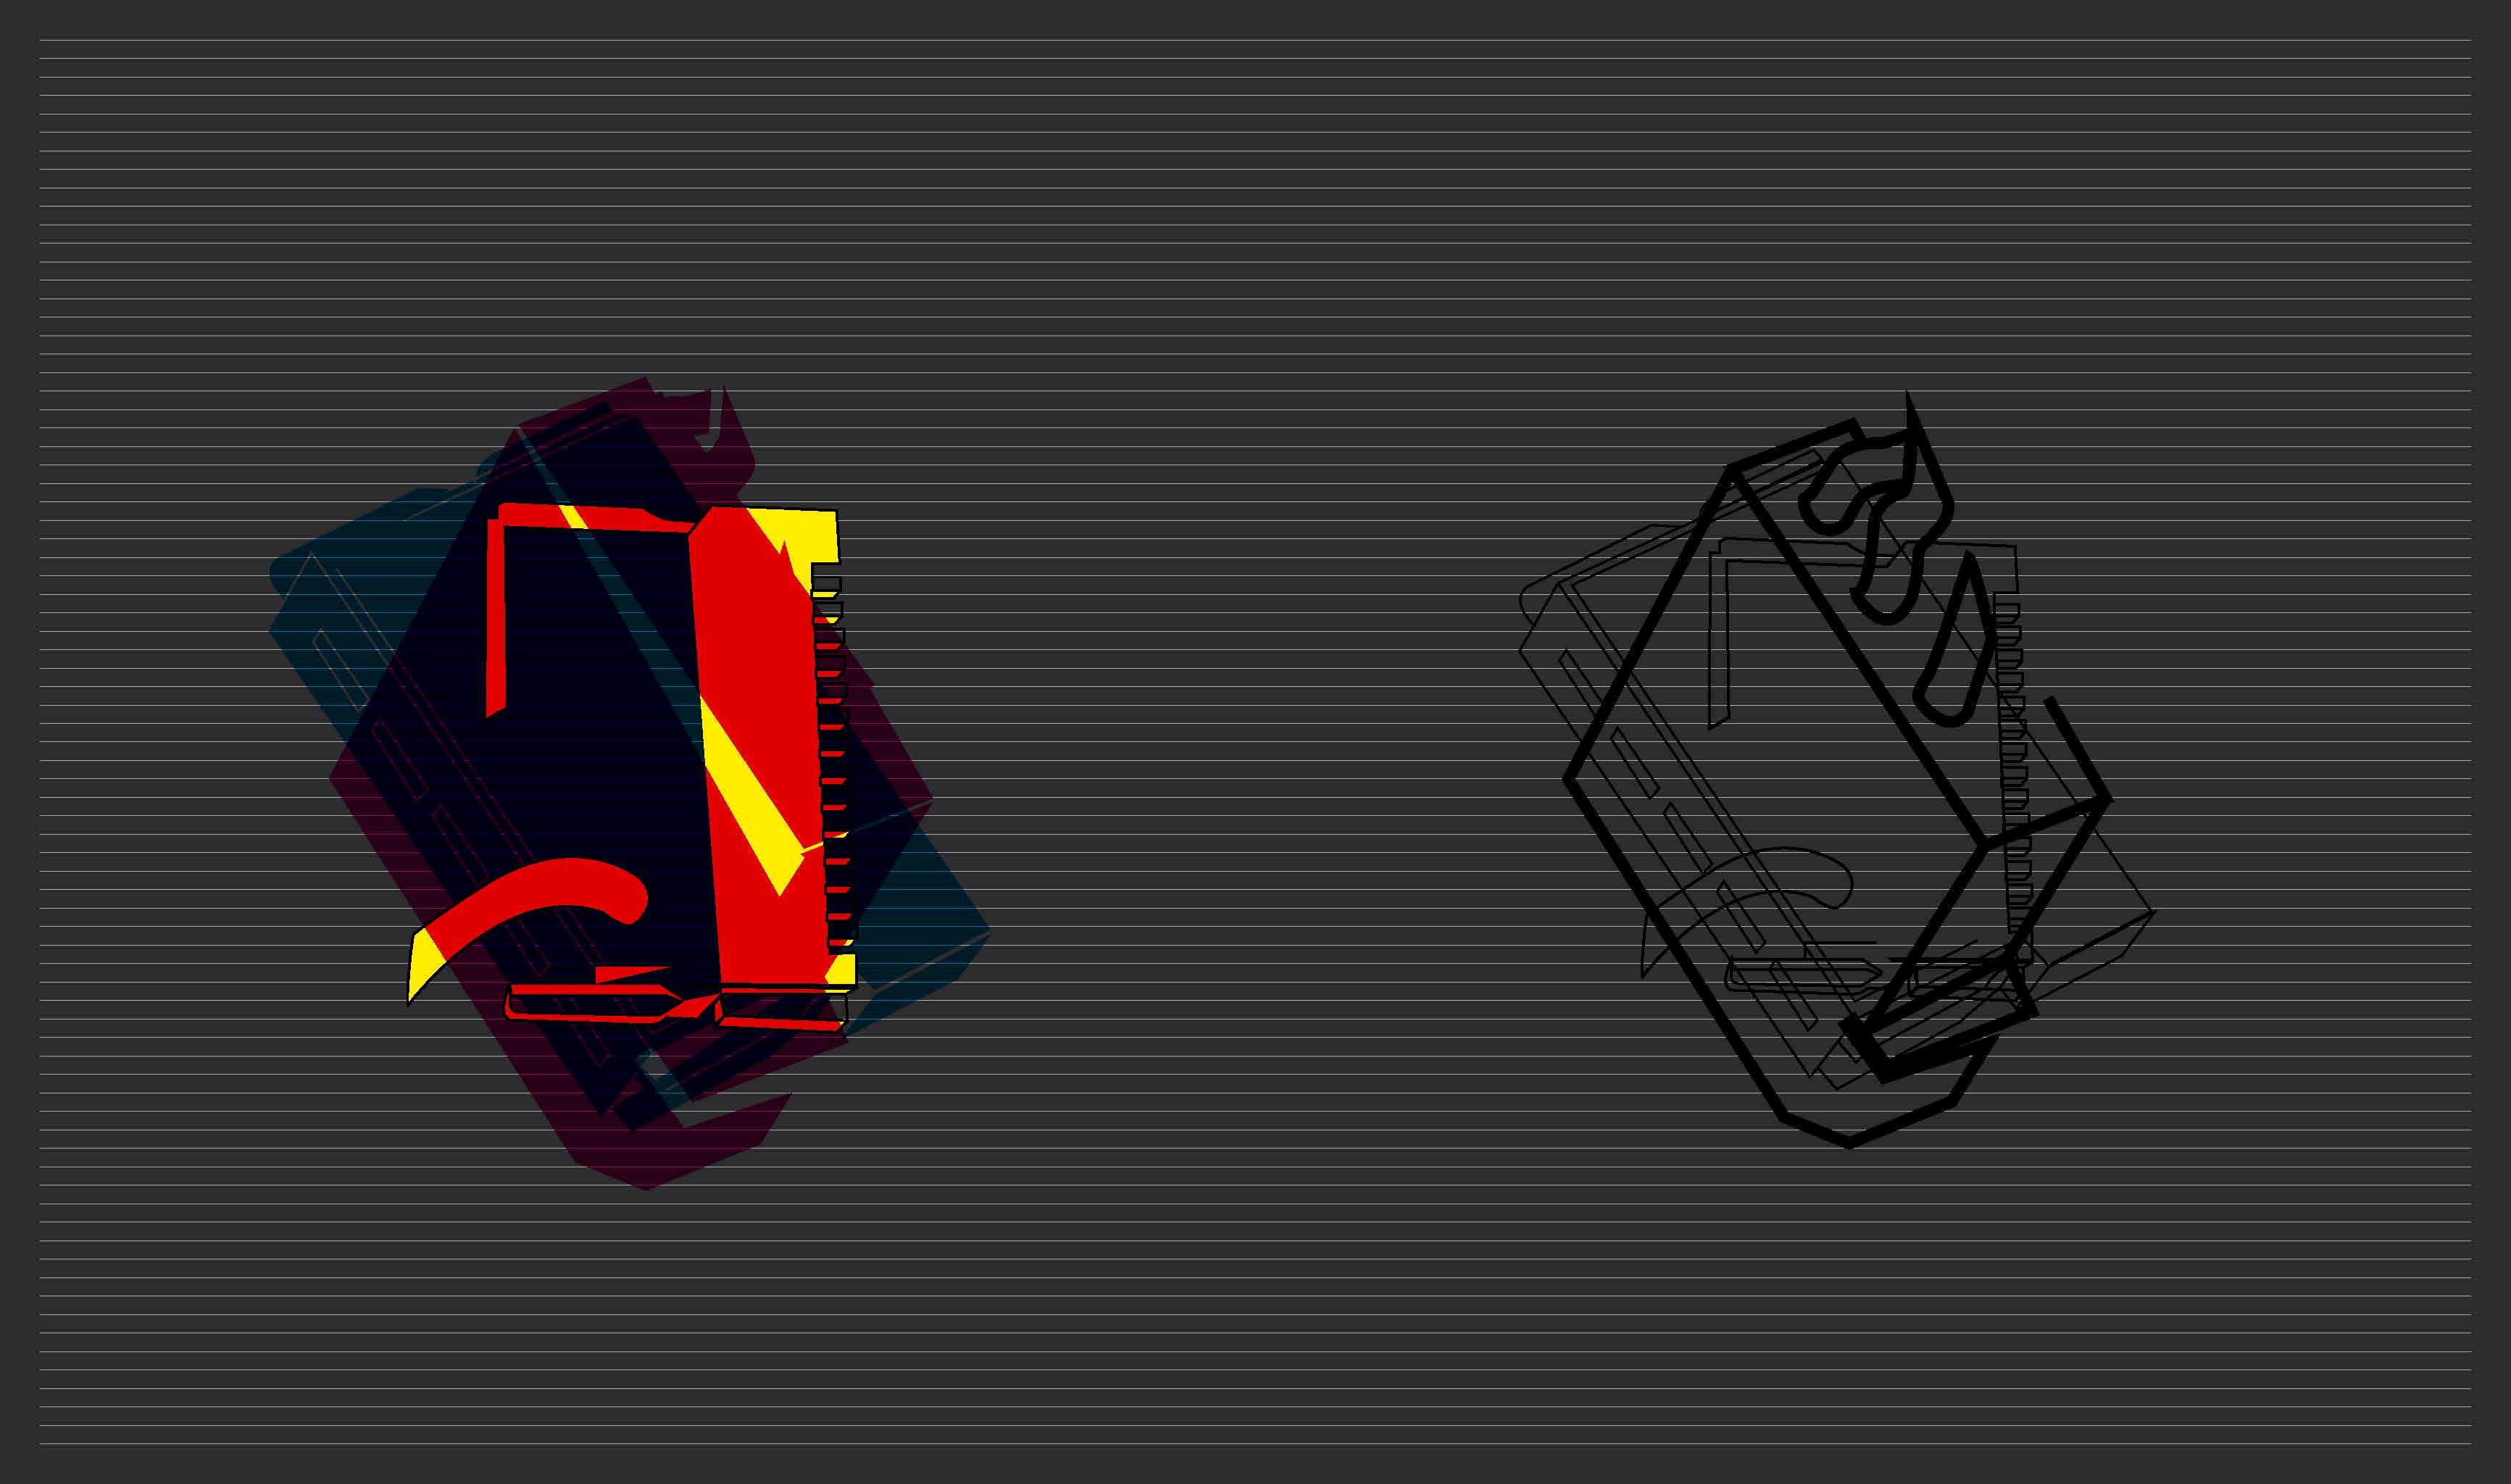 visual_recycling_druckboegen_Seite_065